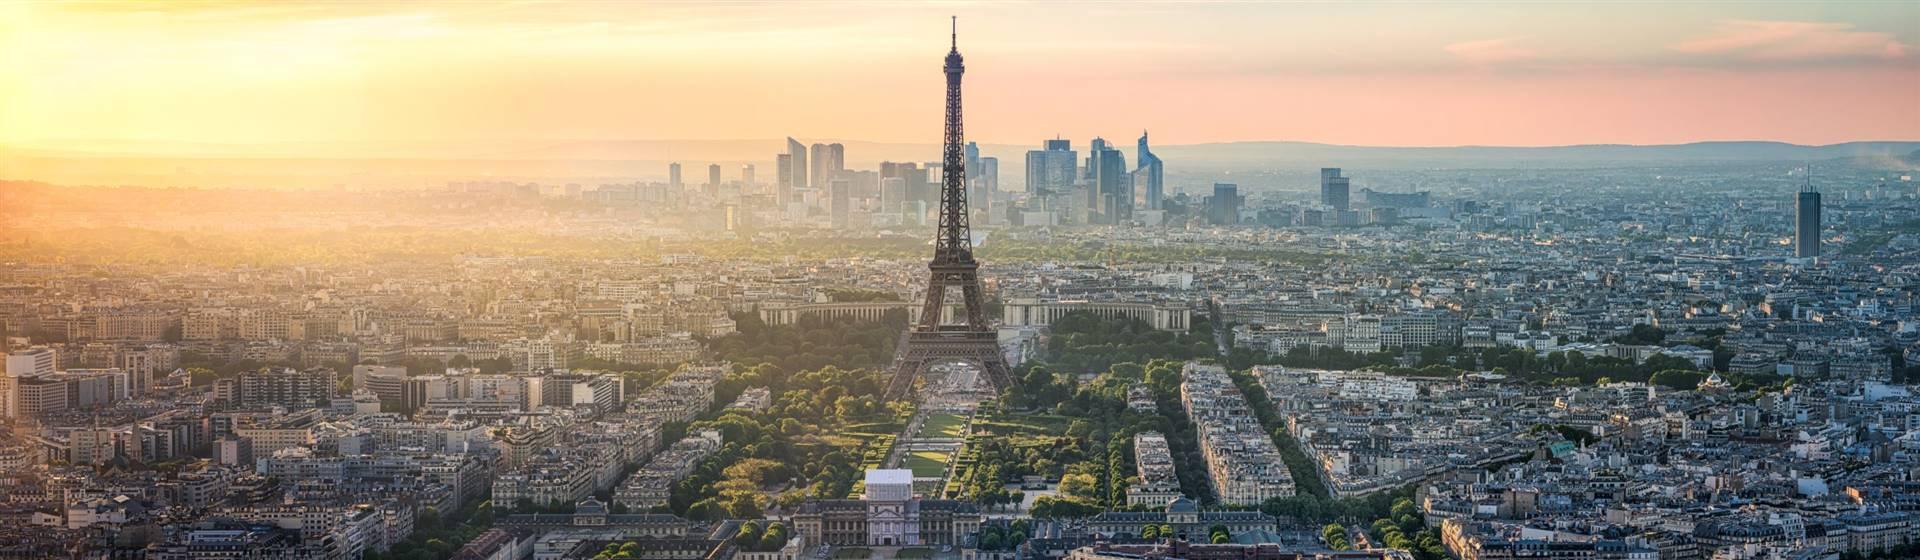 "<img src=""pariswitheiffeltower-shutterstocklr.jpeg"" alt=""Paris - France""/>"